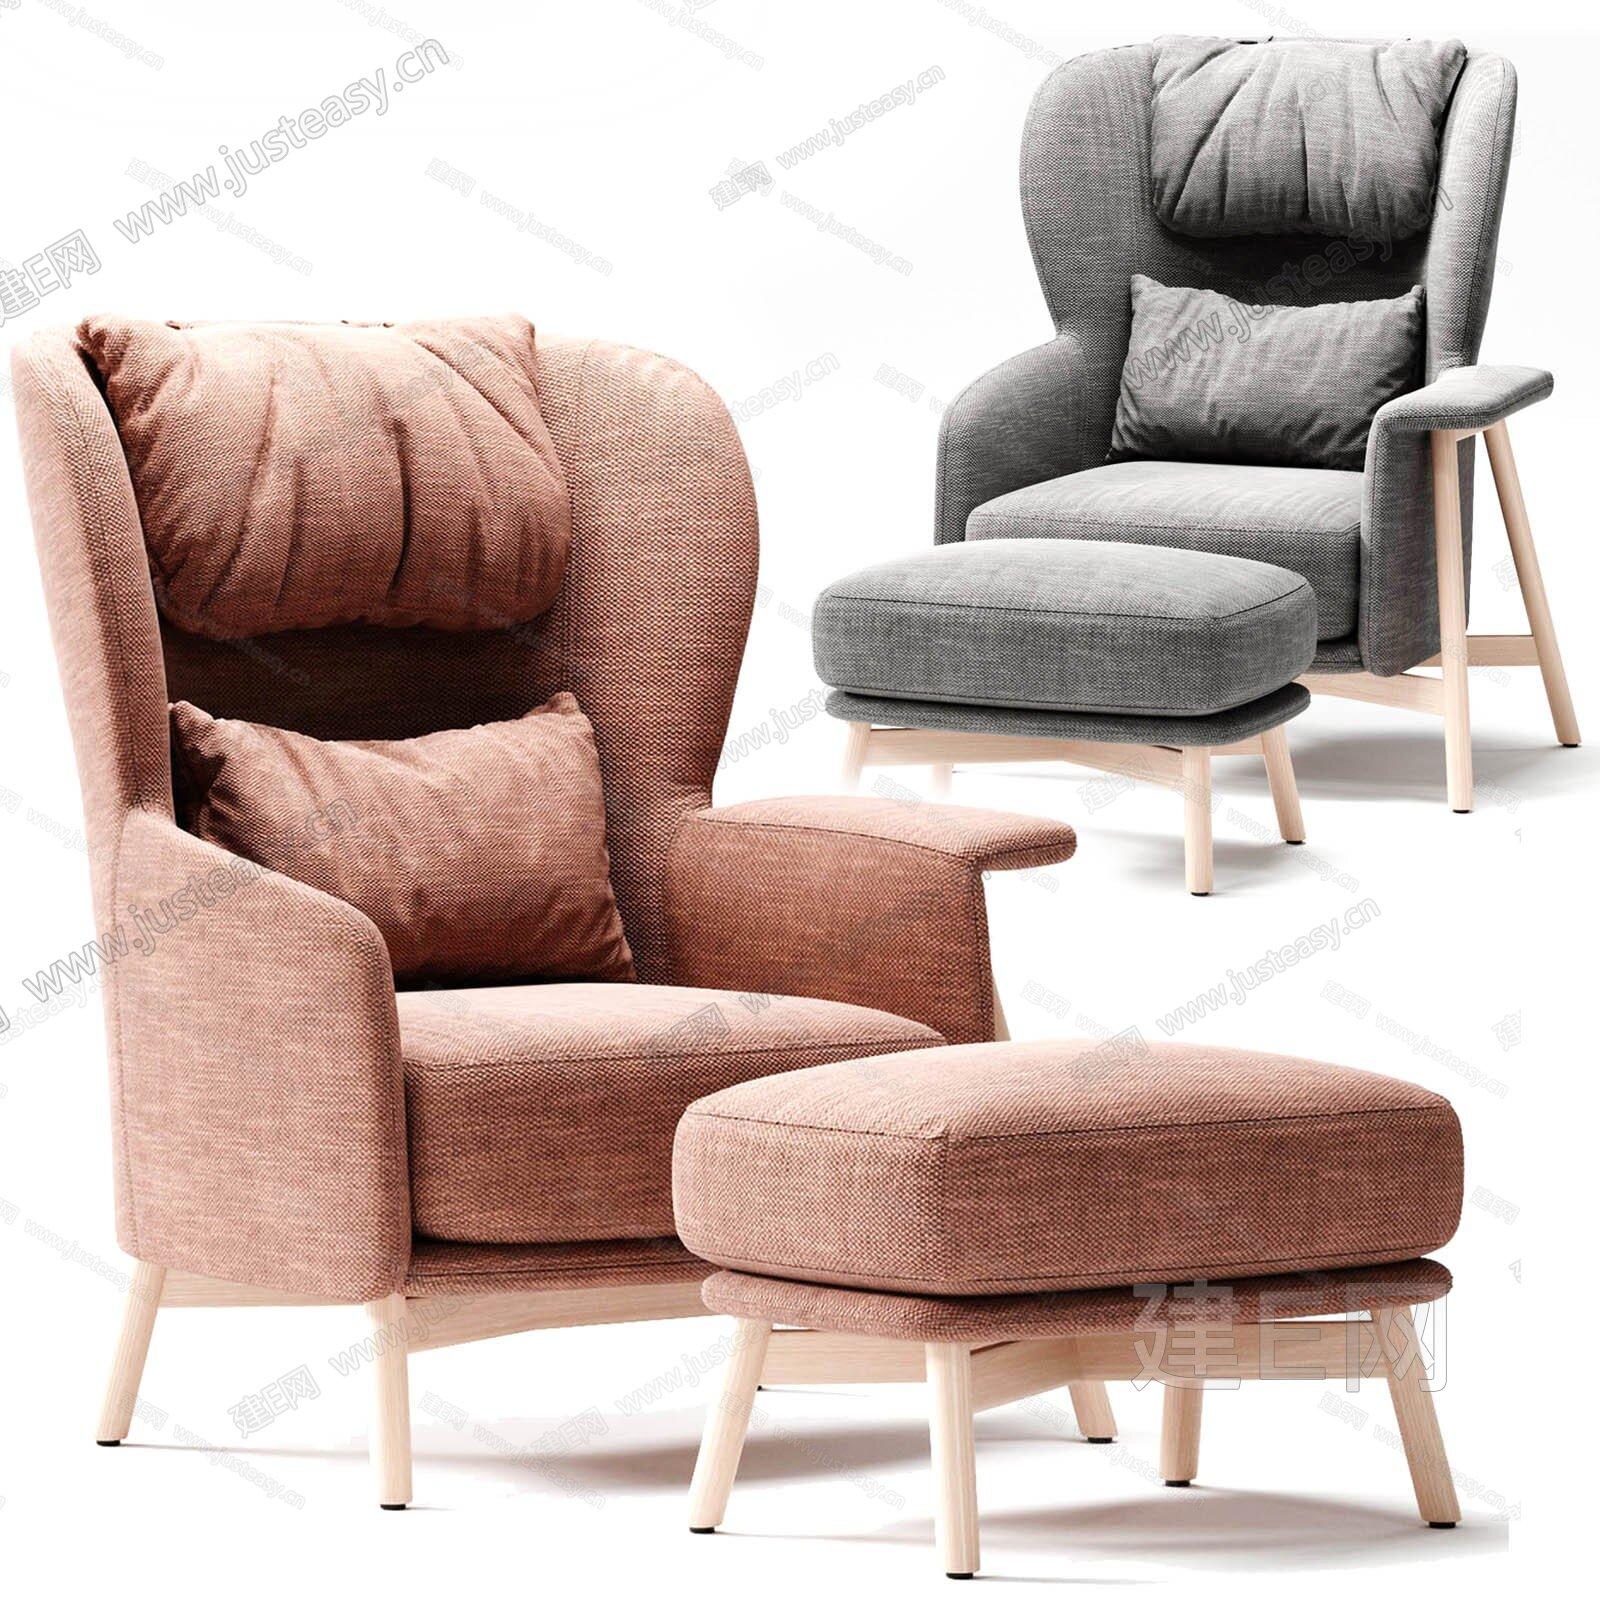 Saba 北欧单椅3d模型